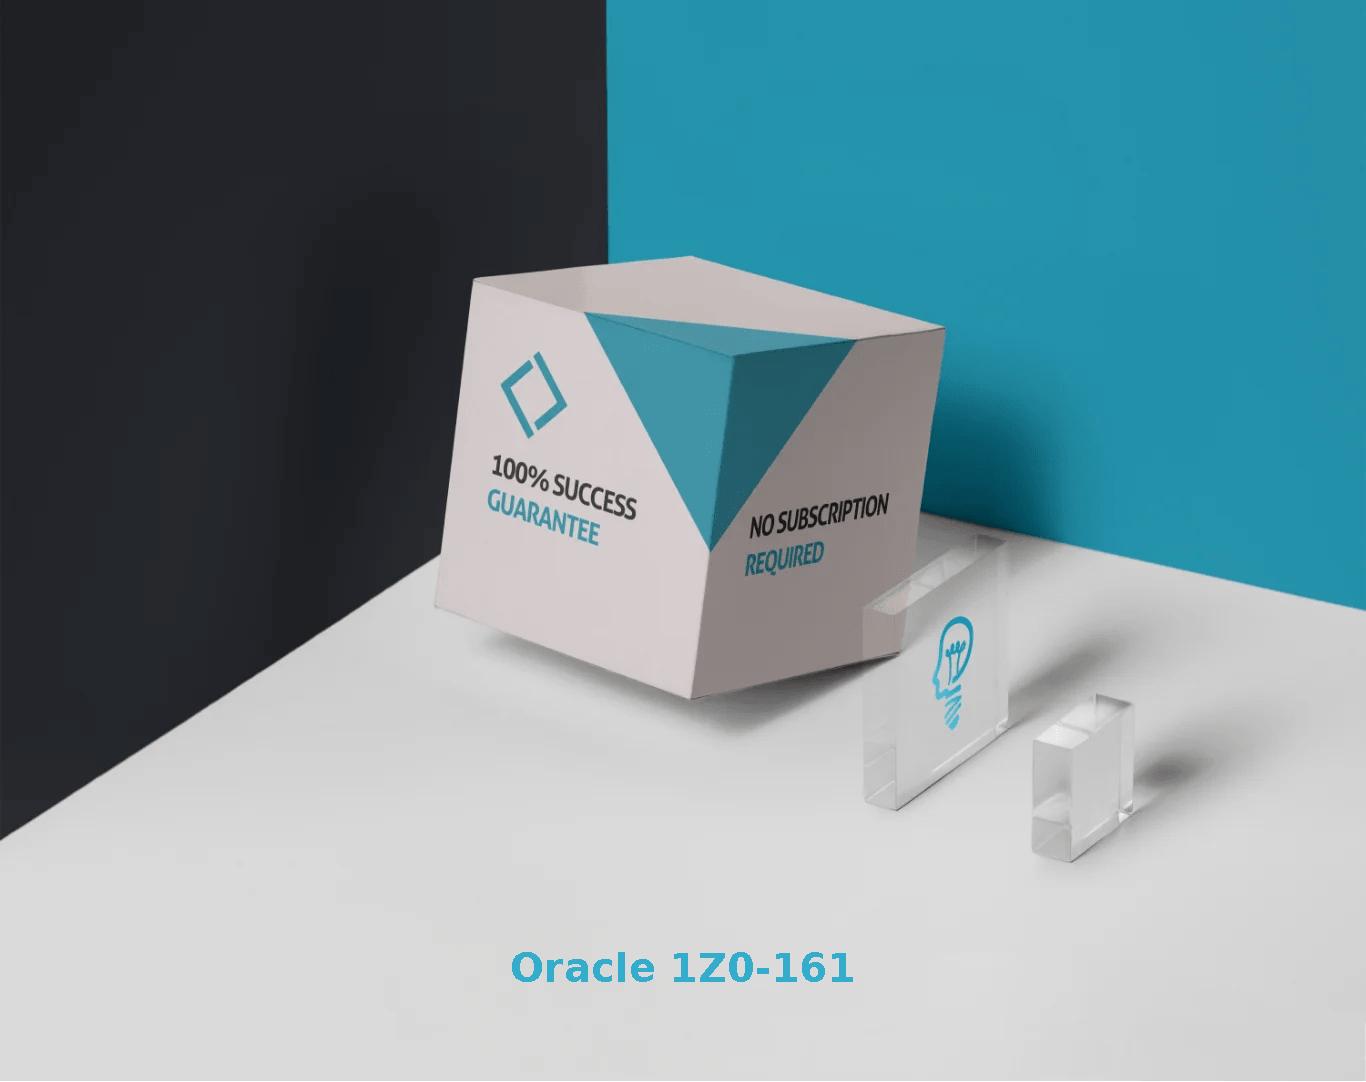 Oracle 1Z0-161 Exams